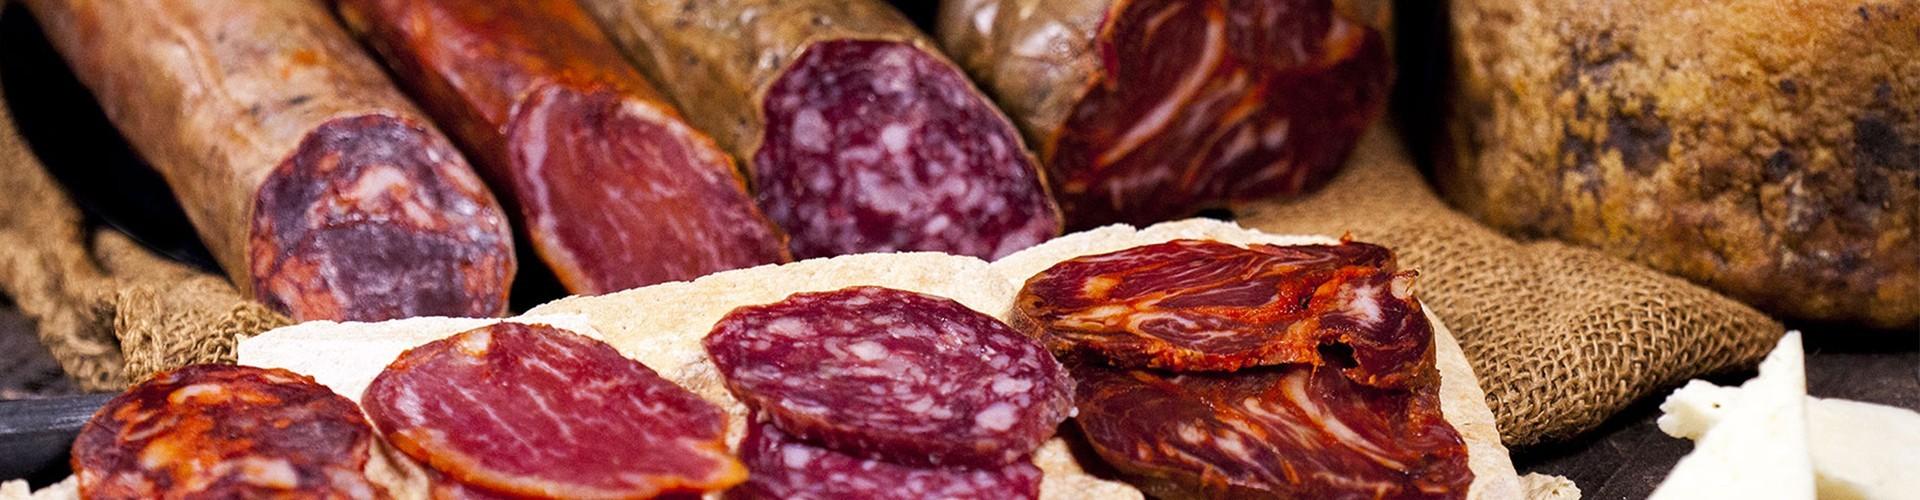 Embutidos ibéricos de Extremadura de Montánchez. Lomo, chorizo,